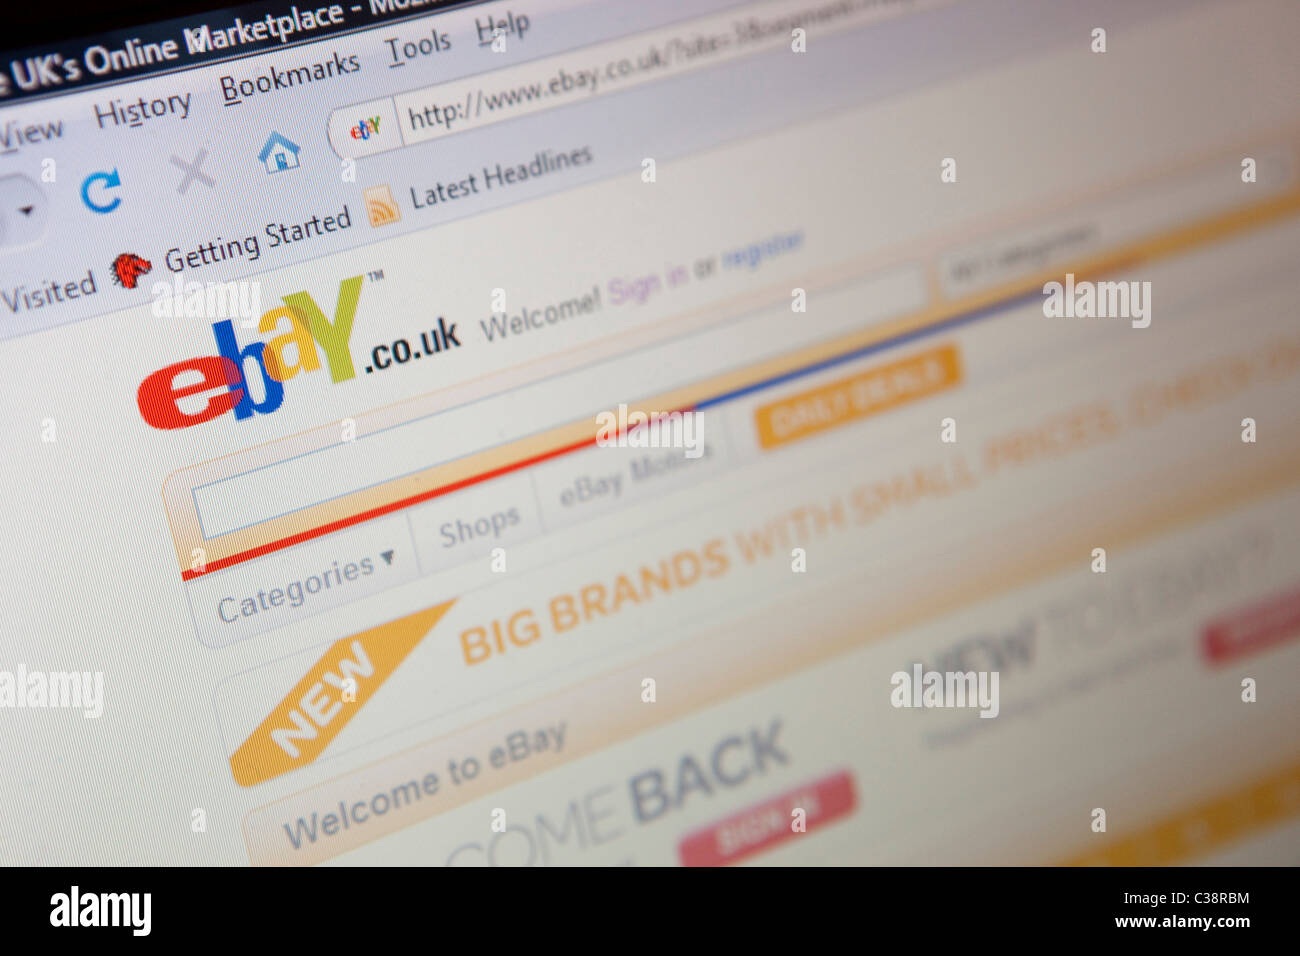 Illustrative image of the Ebay website. - Stock Image